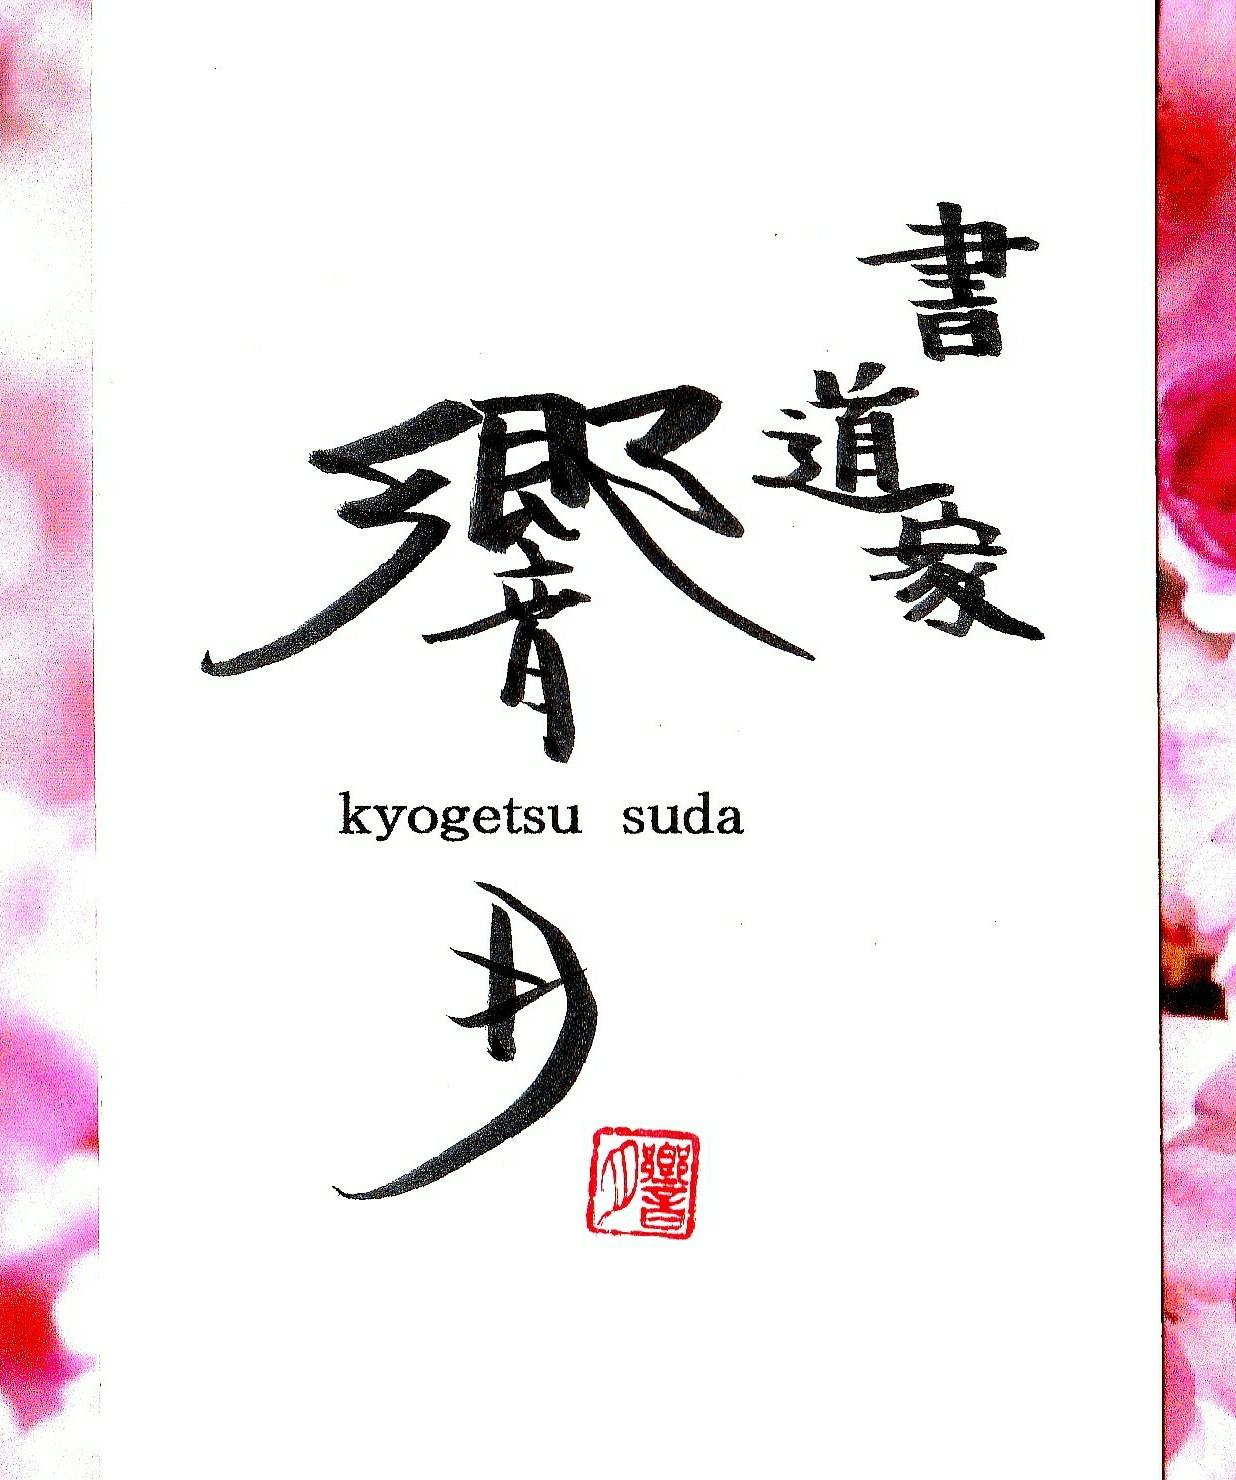 須田響月  ~kyogetsu_sho~